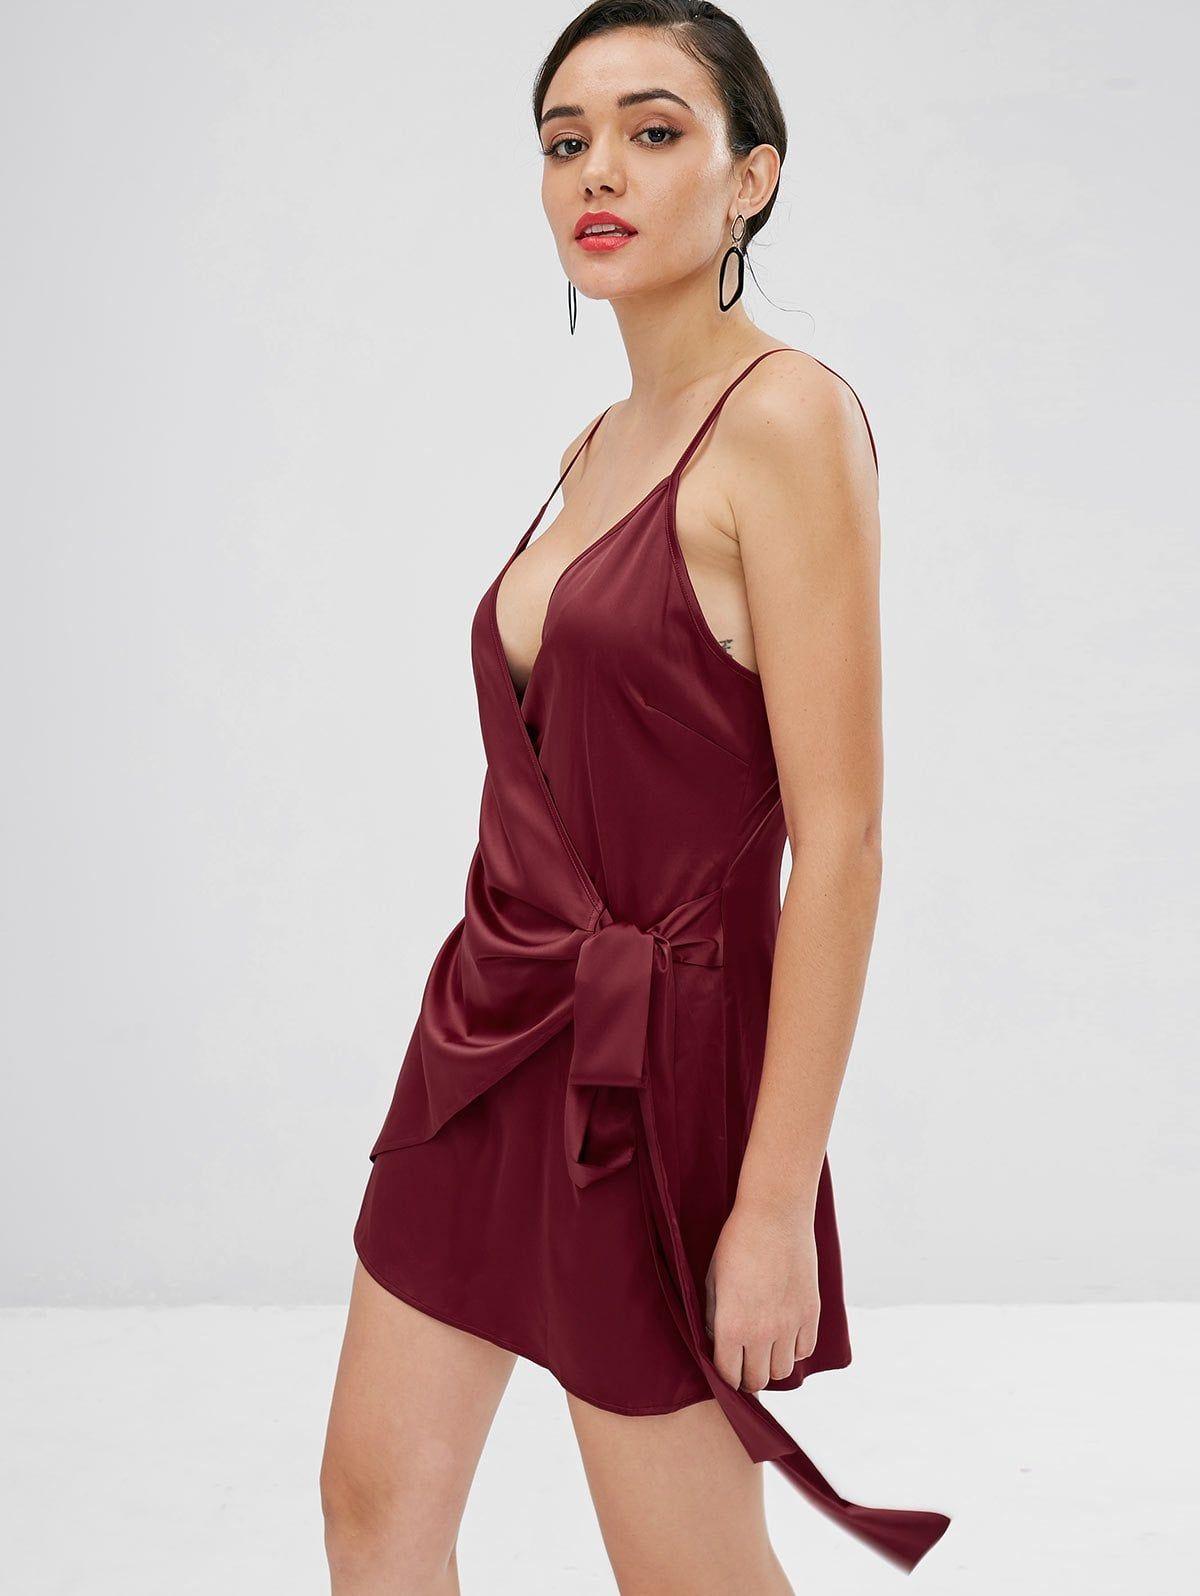 a3b5e5edd822 2018 Satin Wrap Mini Dress In RED WINE M | ZAFUL | Wrap Dress ...